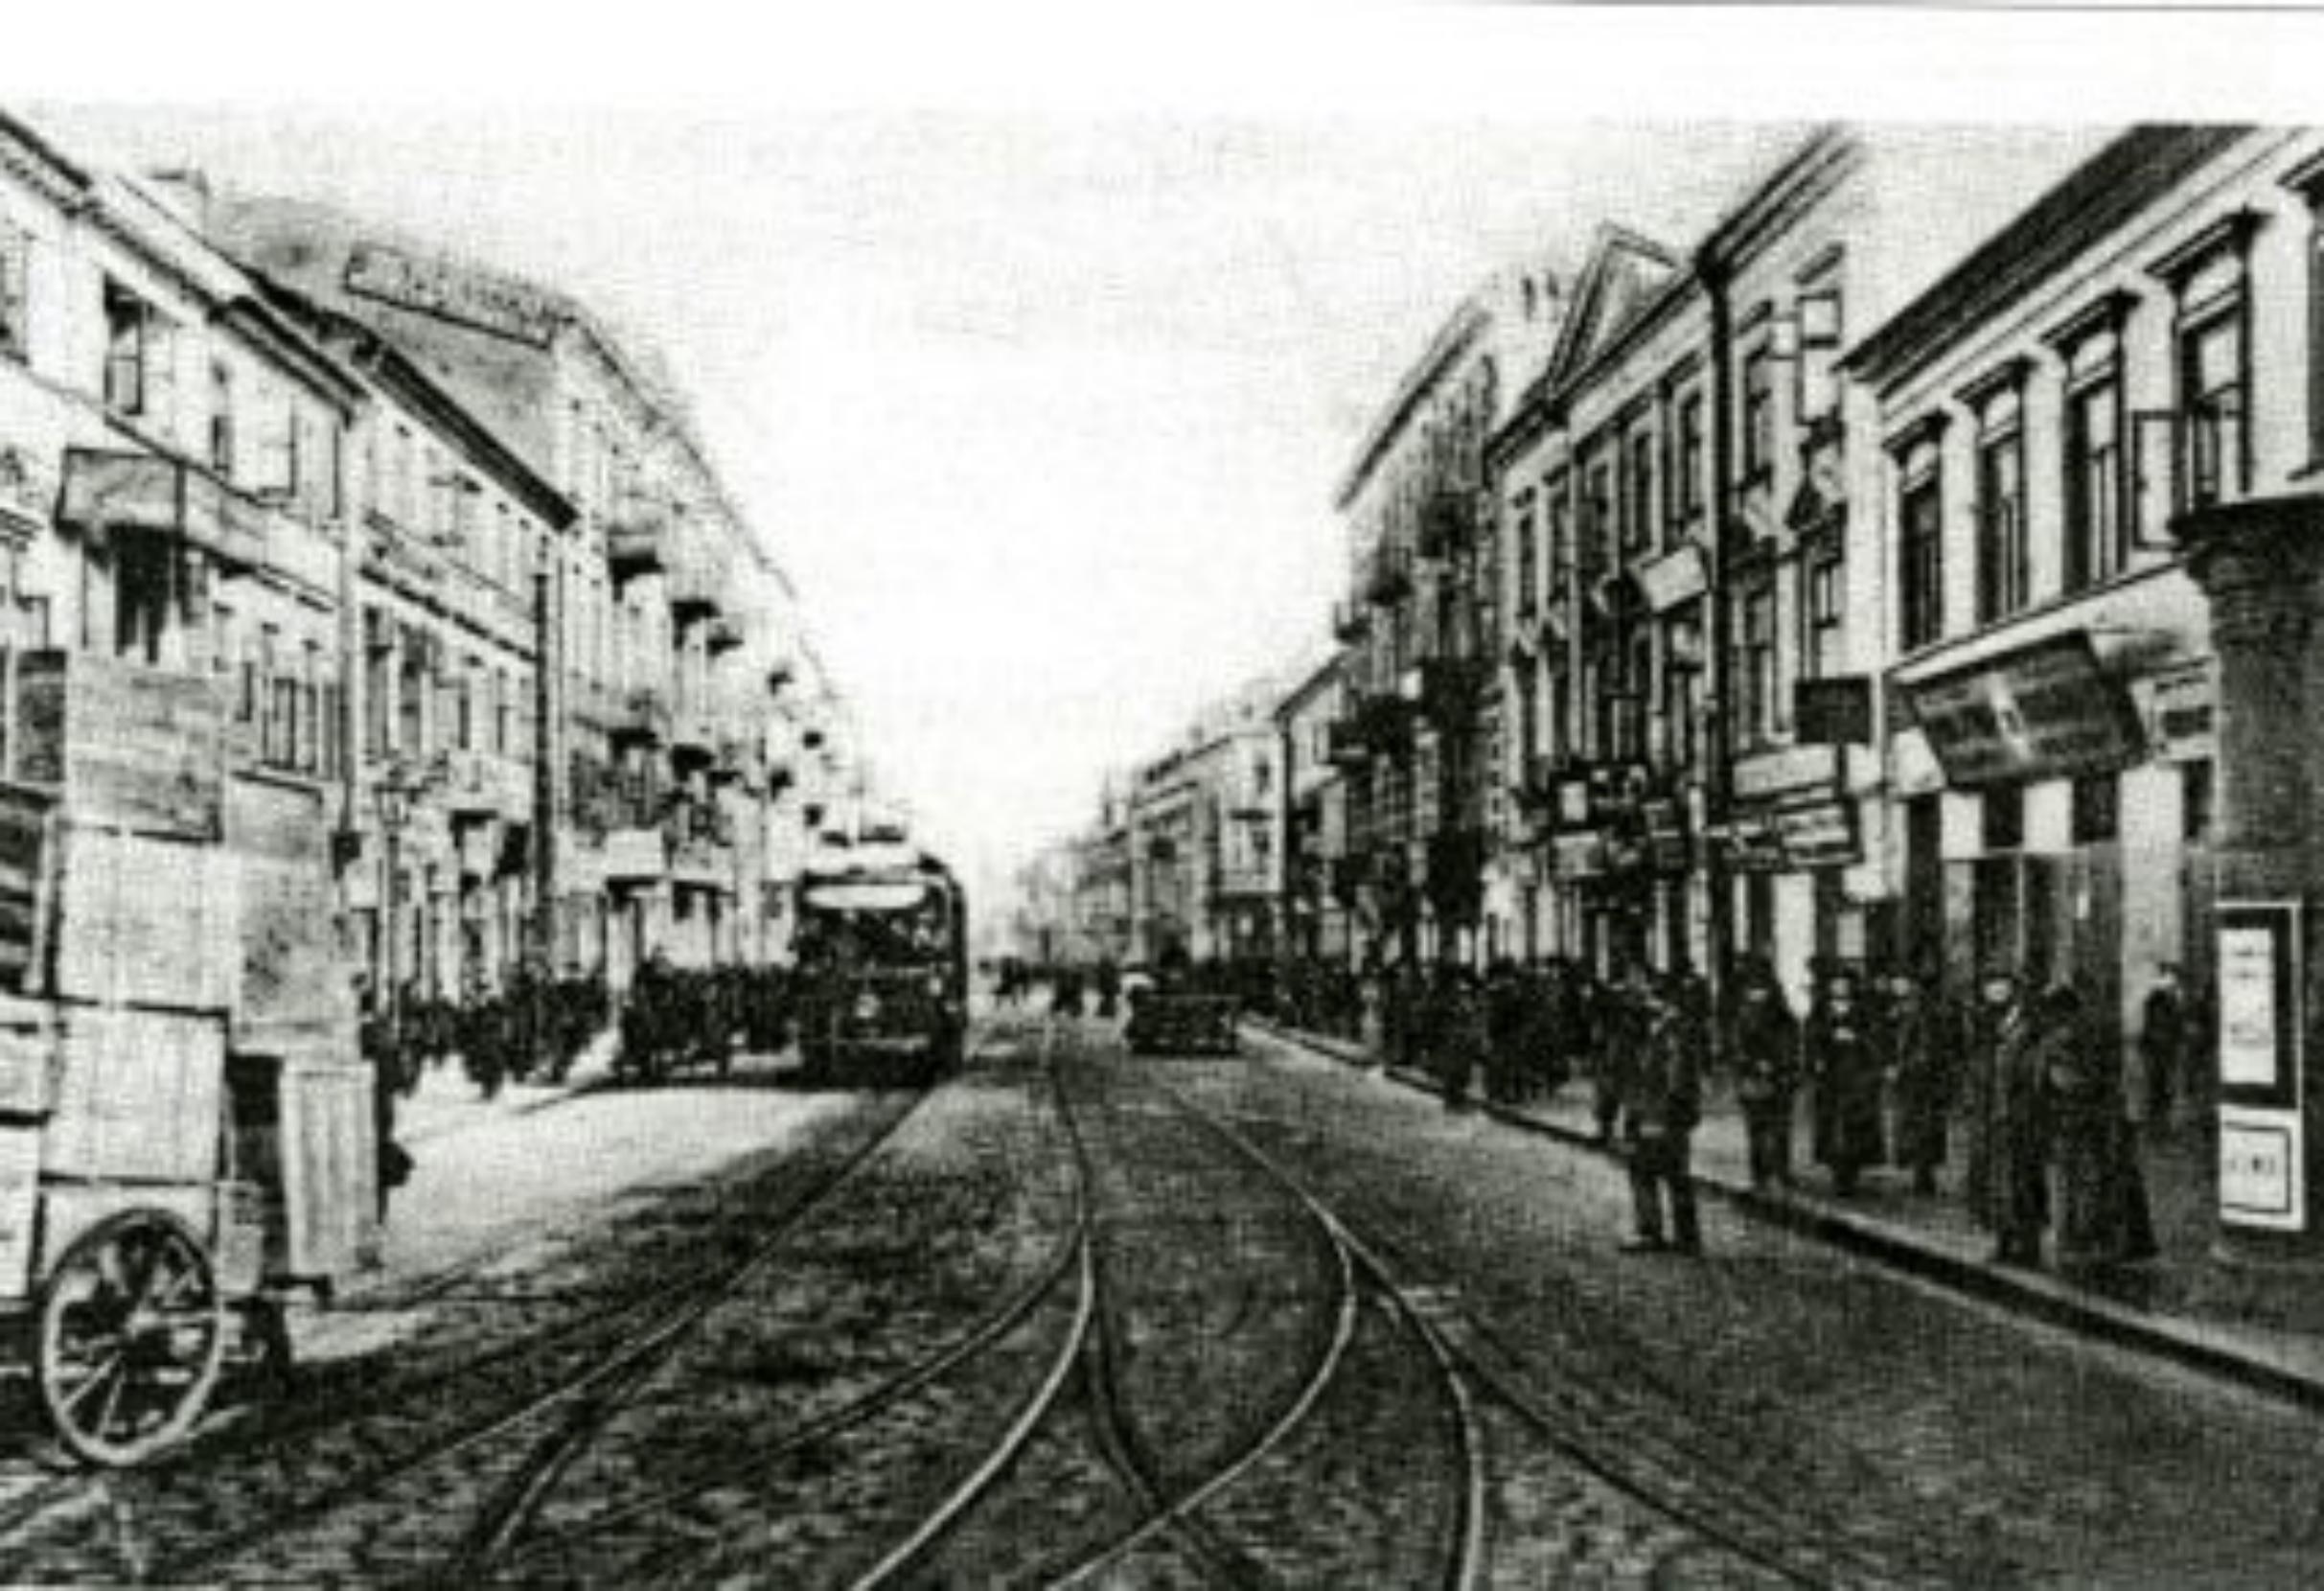 Die Nalewkistrasse Ecke Franciszkanska